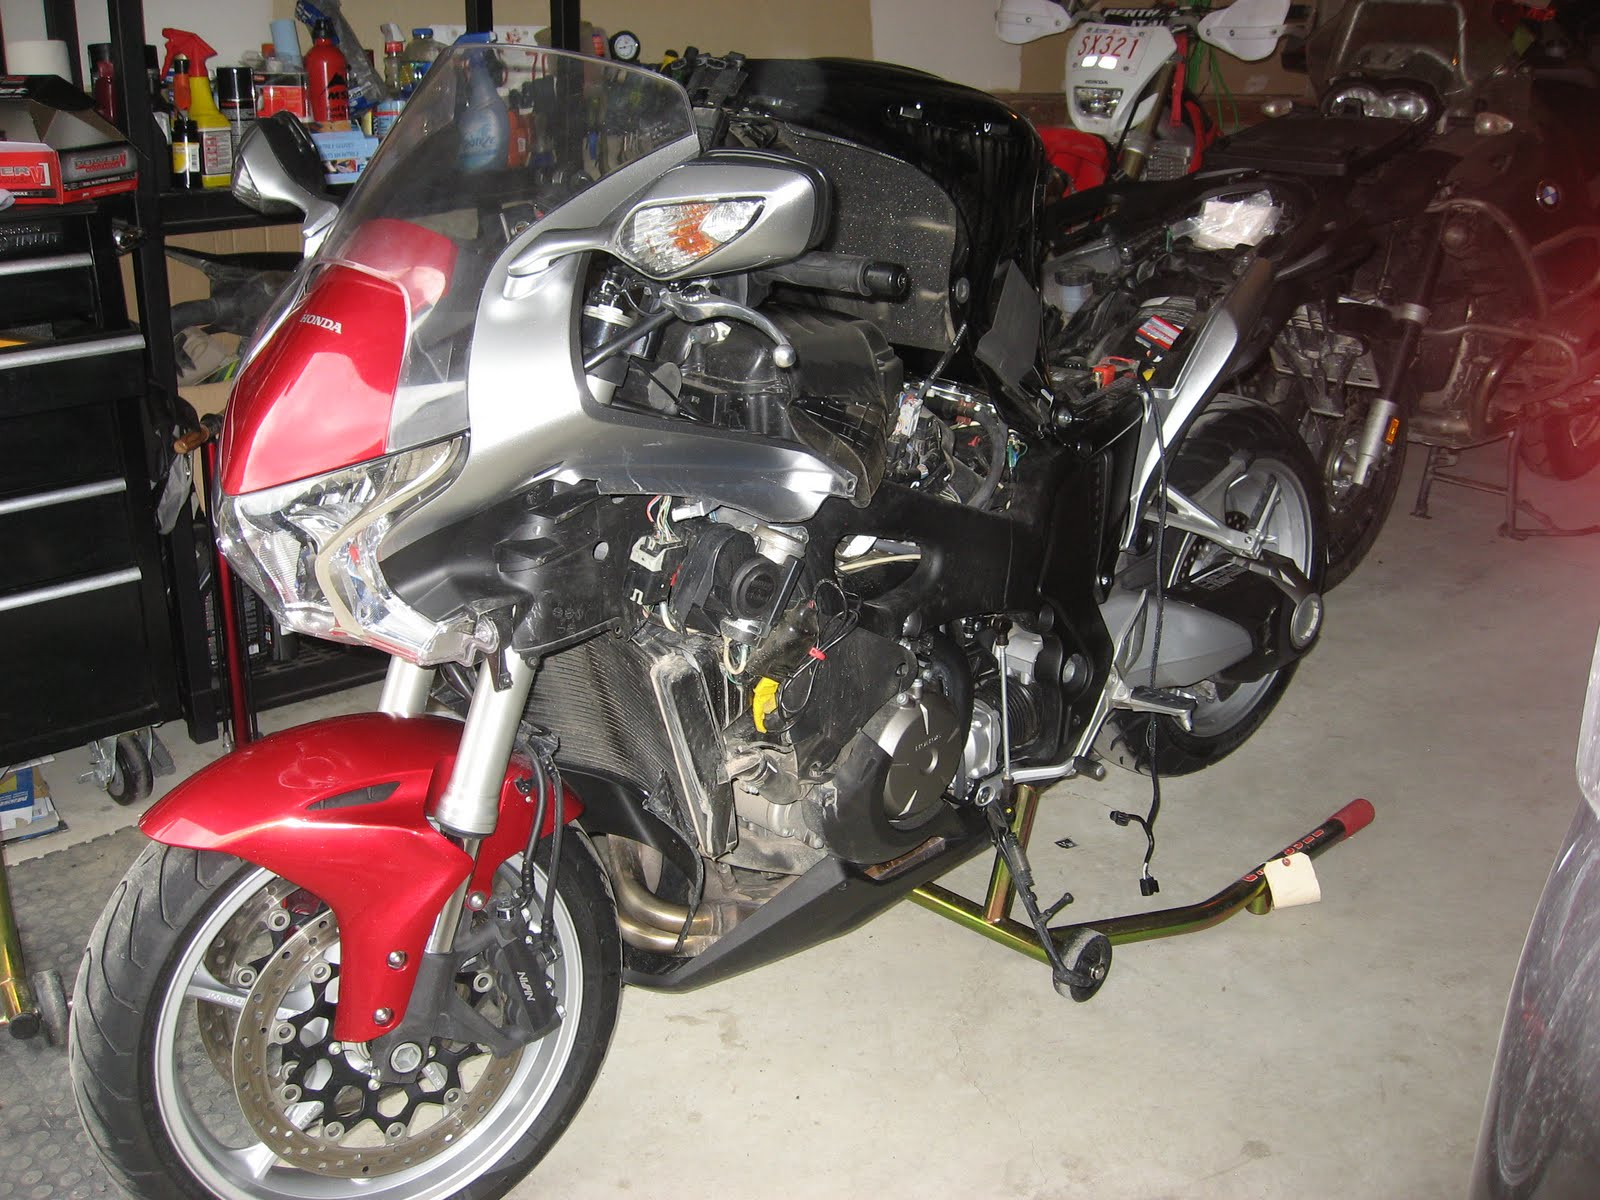 Honda VFR1200F 2014 (Спорт-Туризм), обзор и фото мотоцикла ...